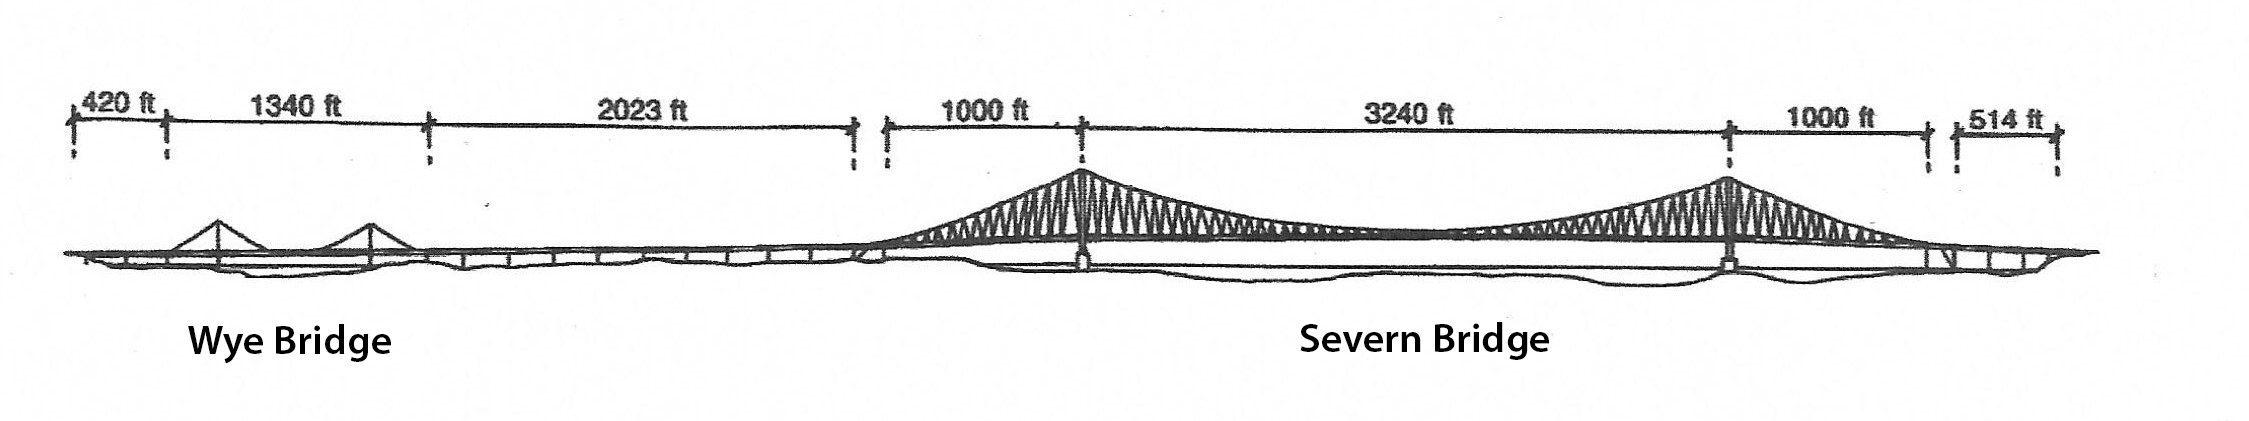 Design of the Severn Bridge | Severn Bridges